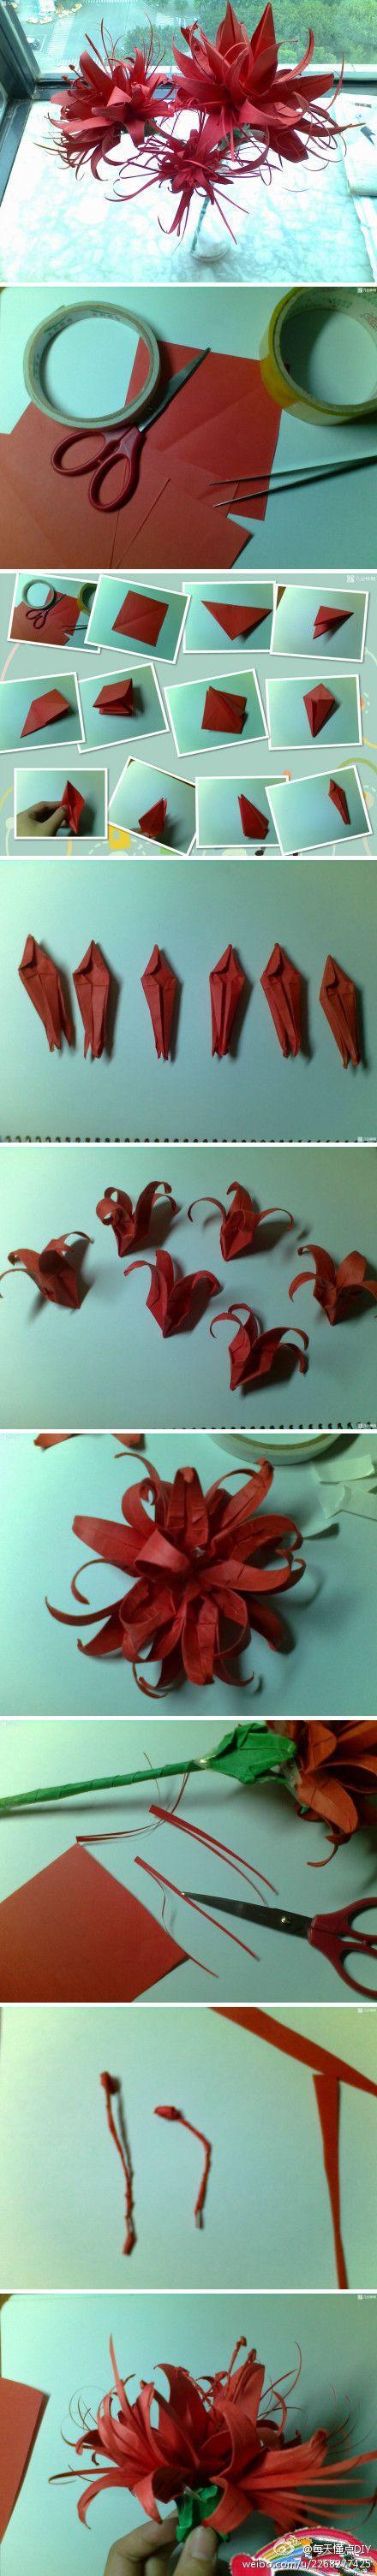 Origami red paper flower DIY Tutorial craft Decor